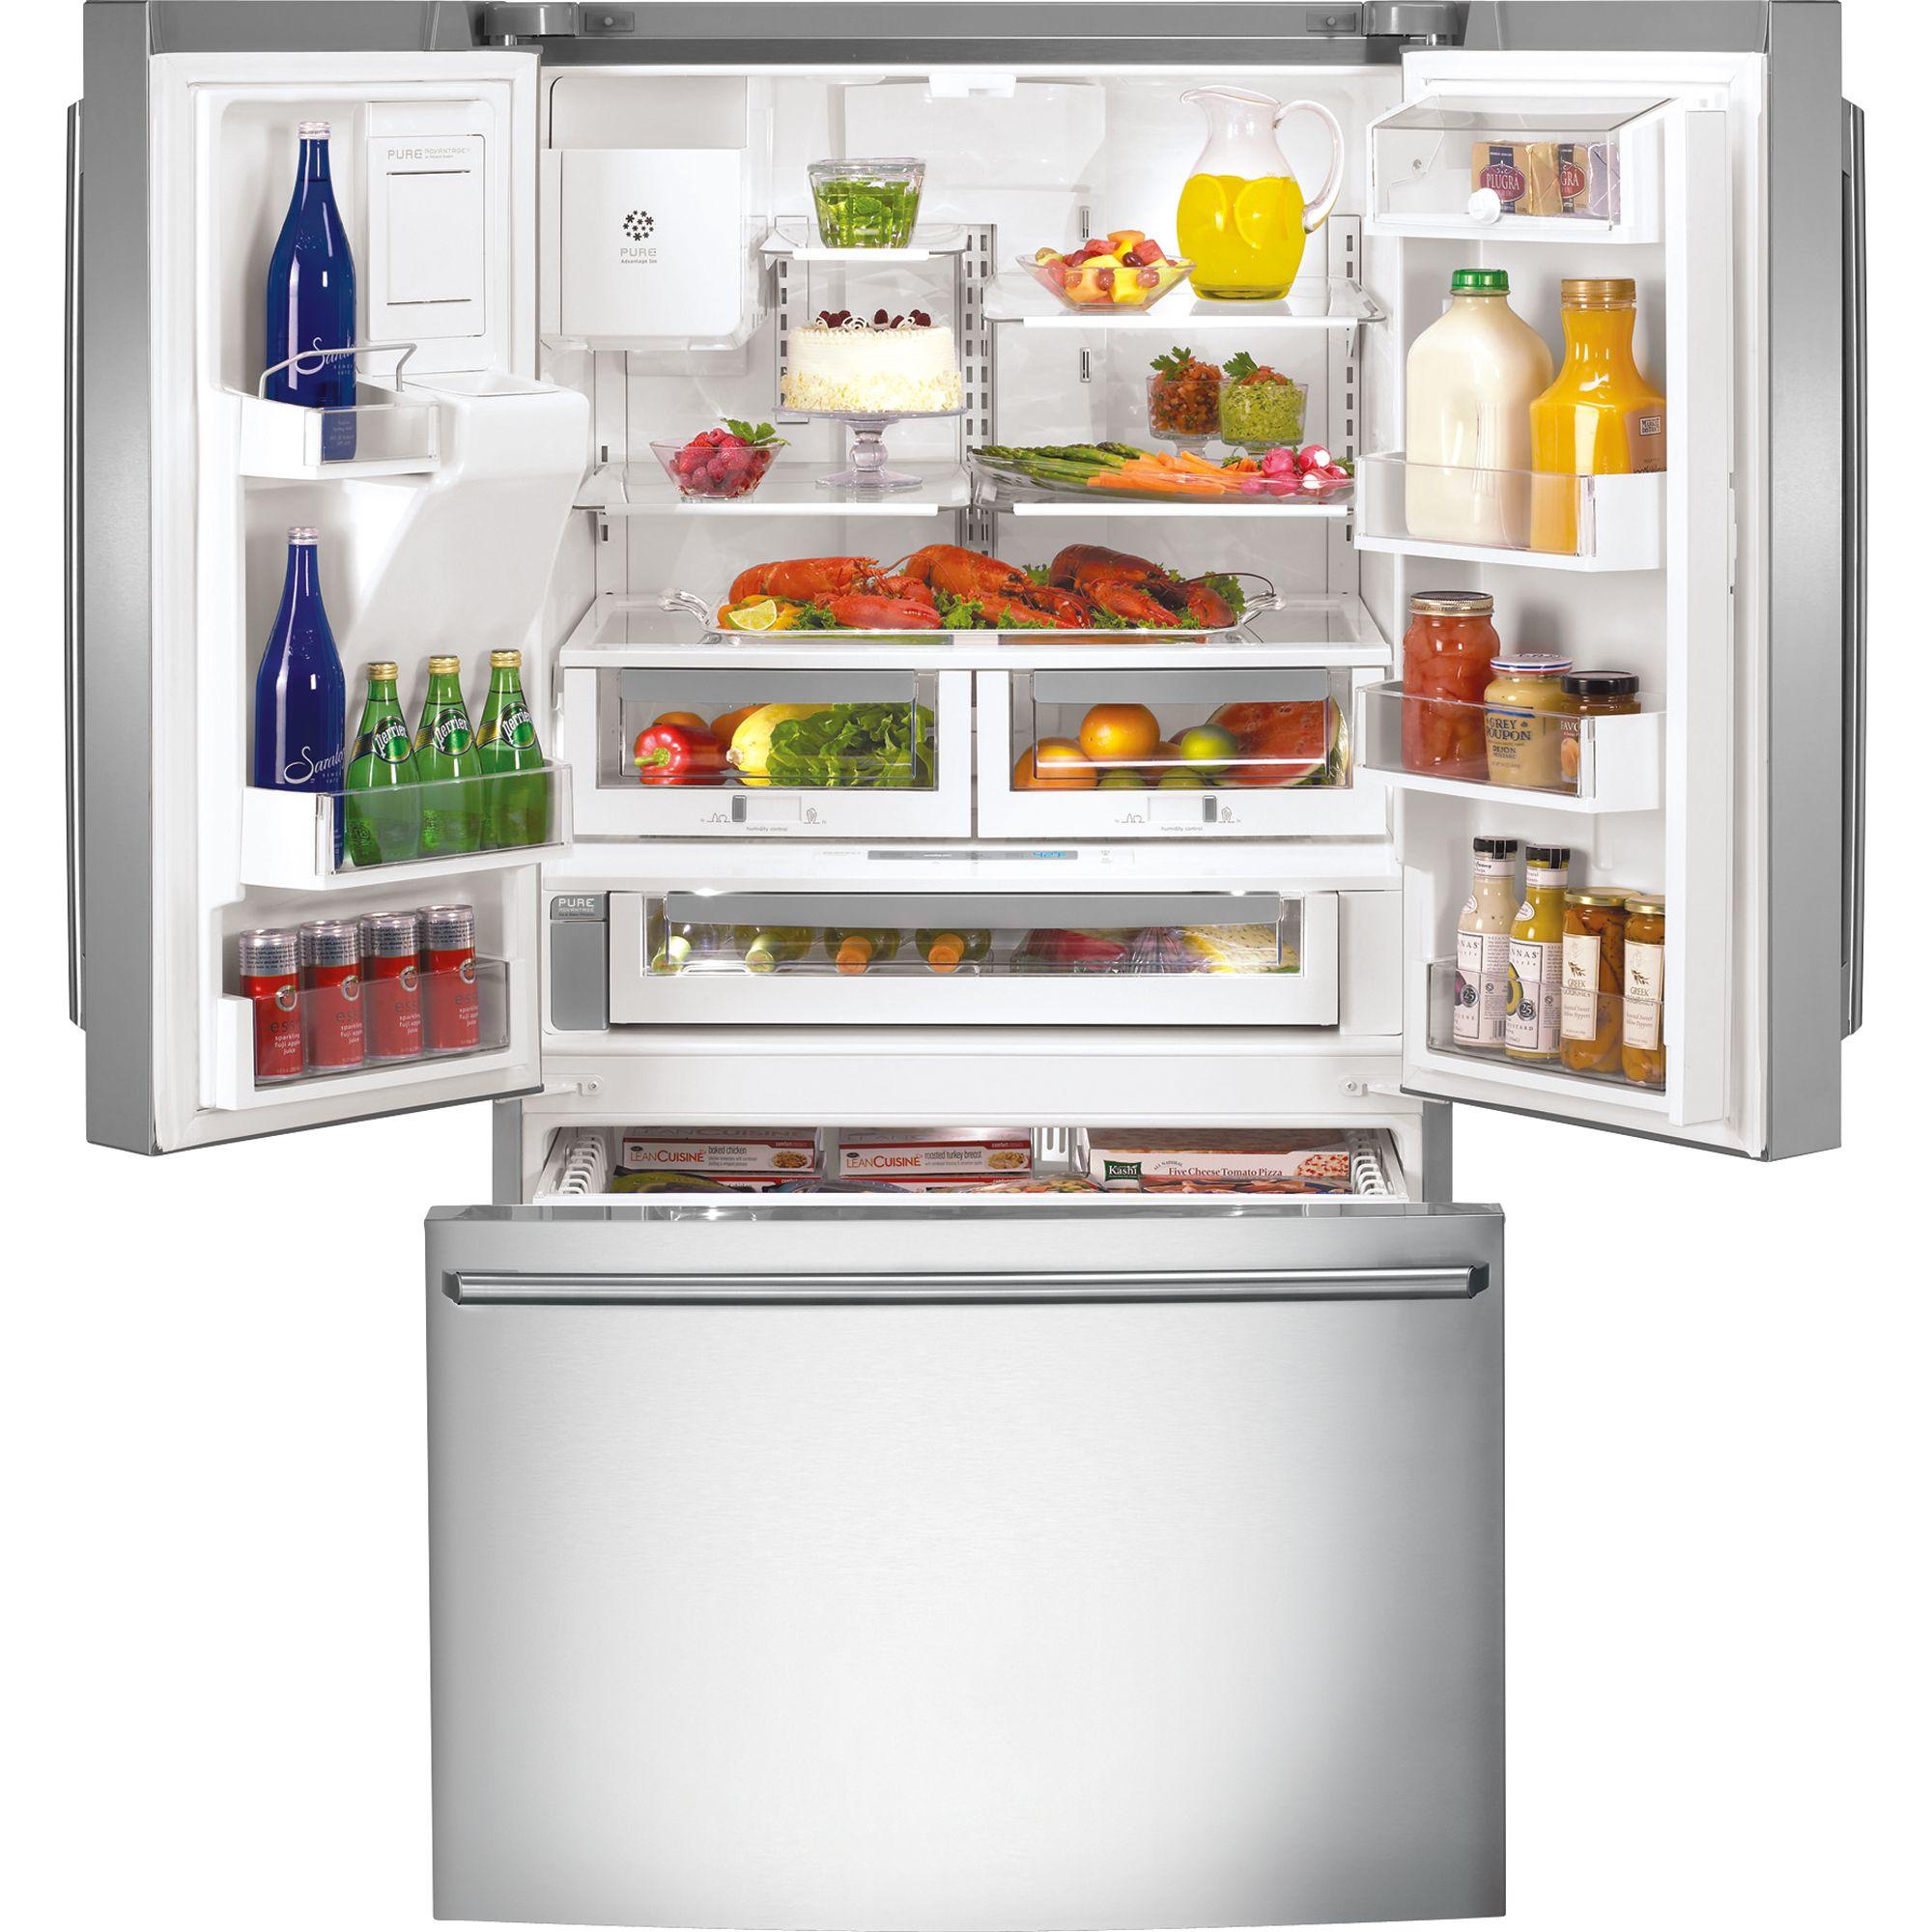 Electrolux 27.8 cu. ft. French-Door Bottom-Freezer Refrigerator